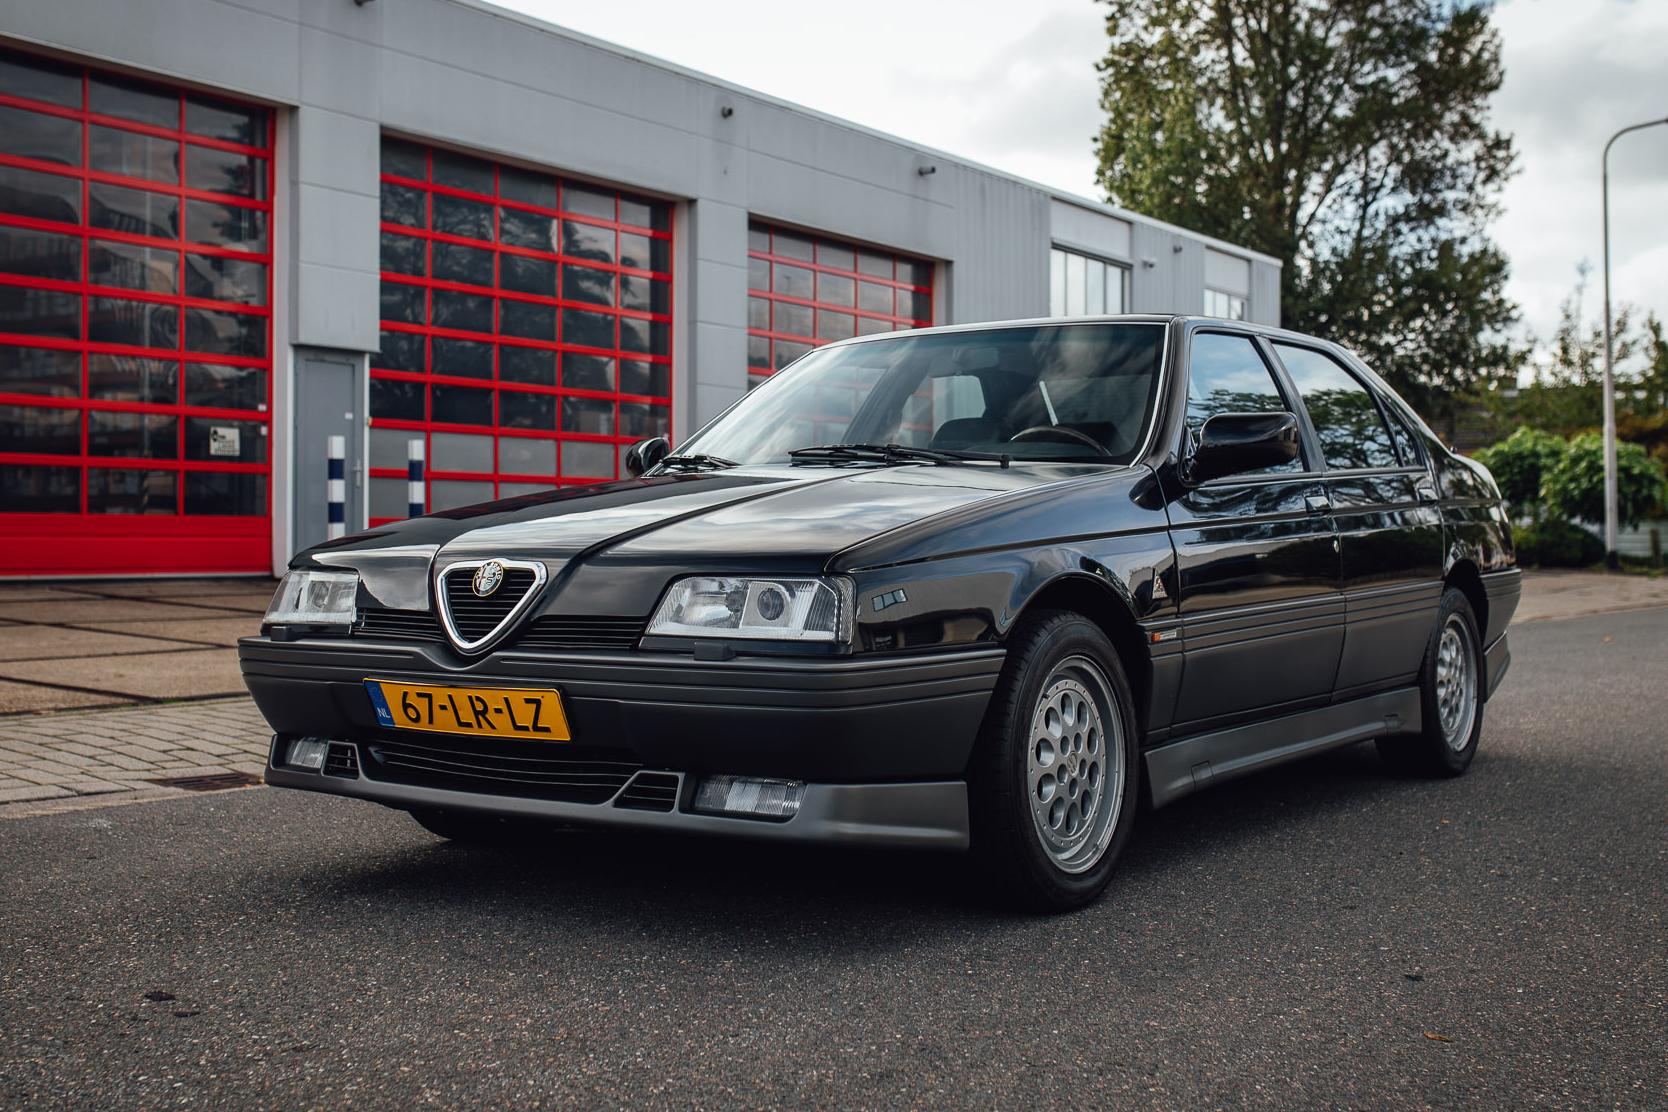 1995 ALFA ROMEO 164 Q4 3.0 V6 - LHD